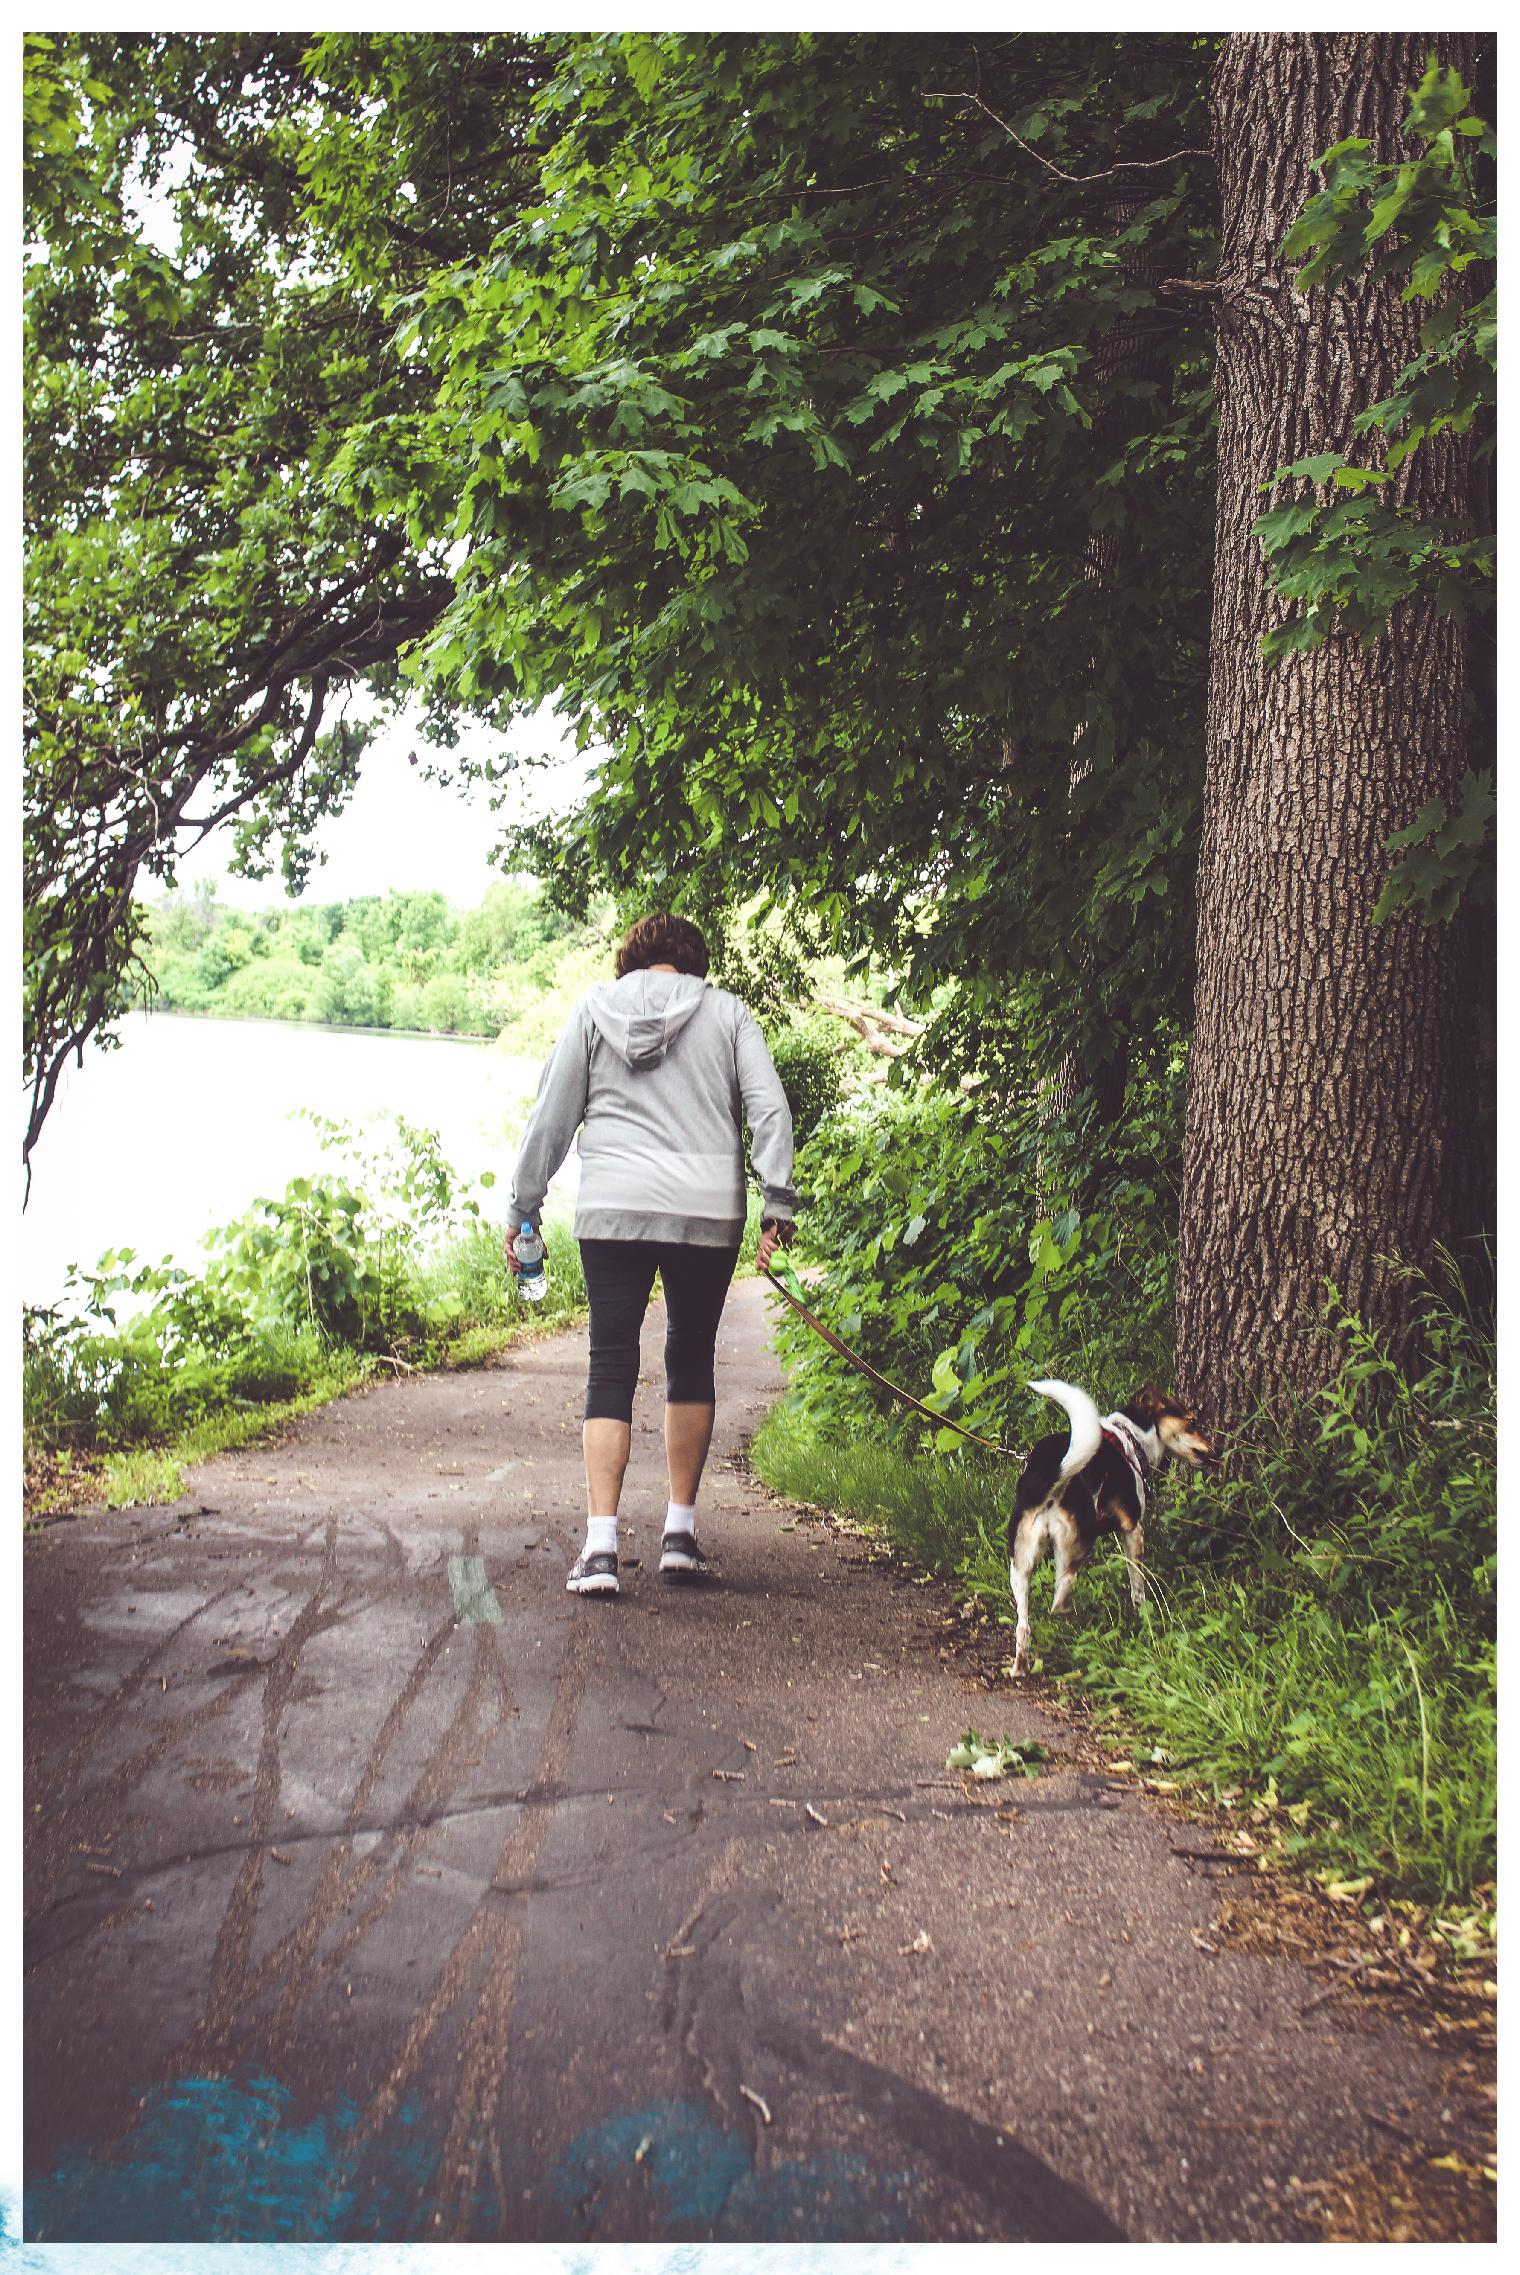 Pixie walk